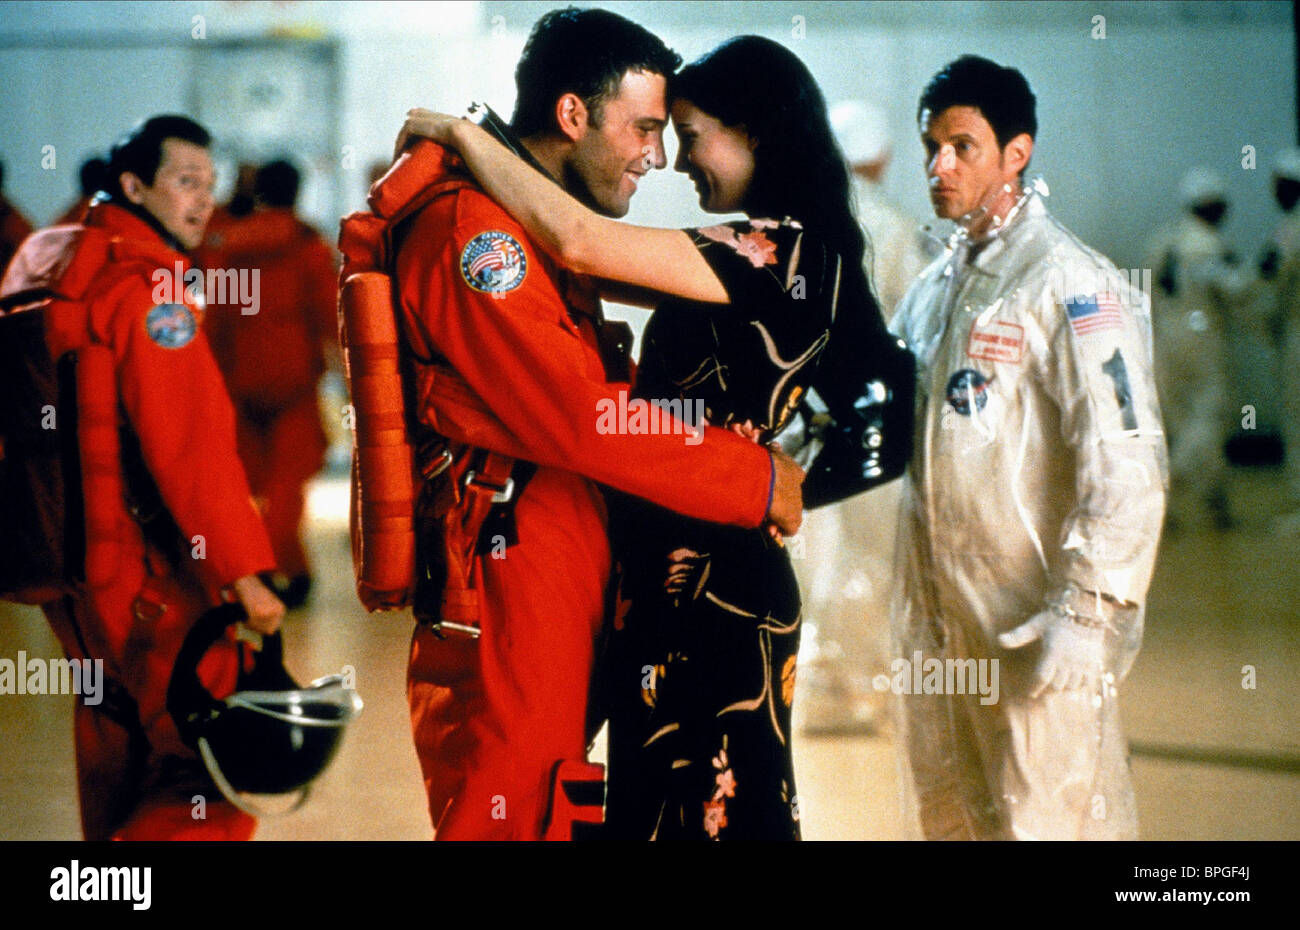 BEN AFFLECK & LIV TYLER ARMAGEDDON (1998 Stock Photo ... Ben Affleck Armageddon